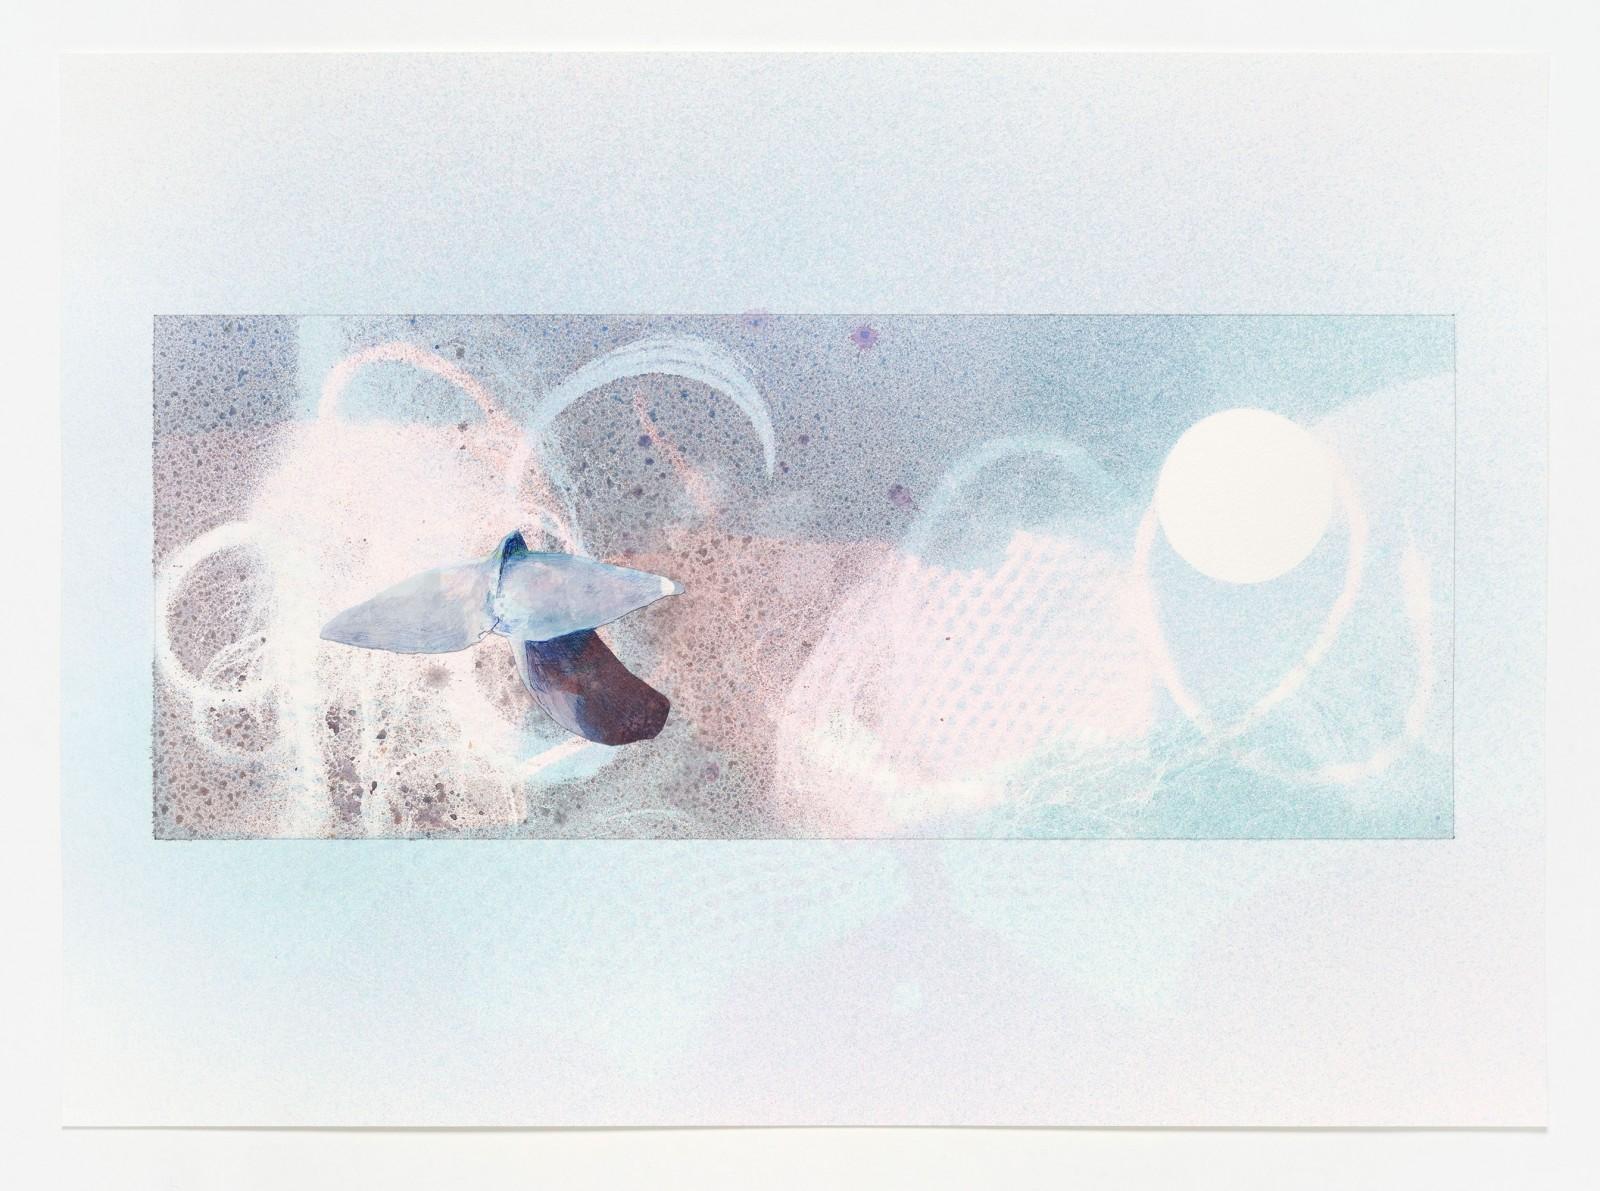 Kim Nekarda: untitled, 2019, carbon, ballpen & watercolour on paper, 41 x 57 cm